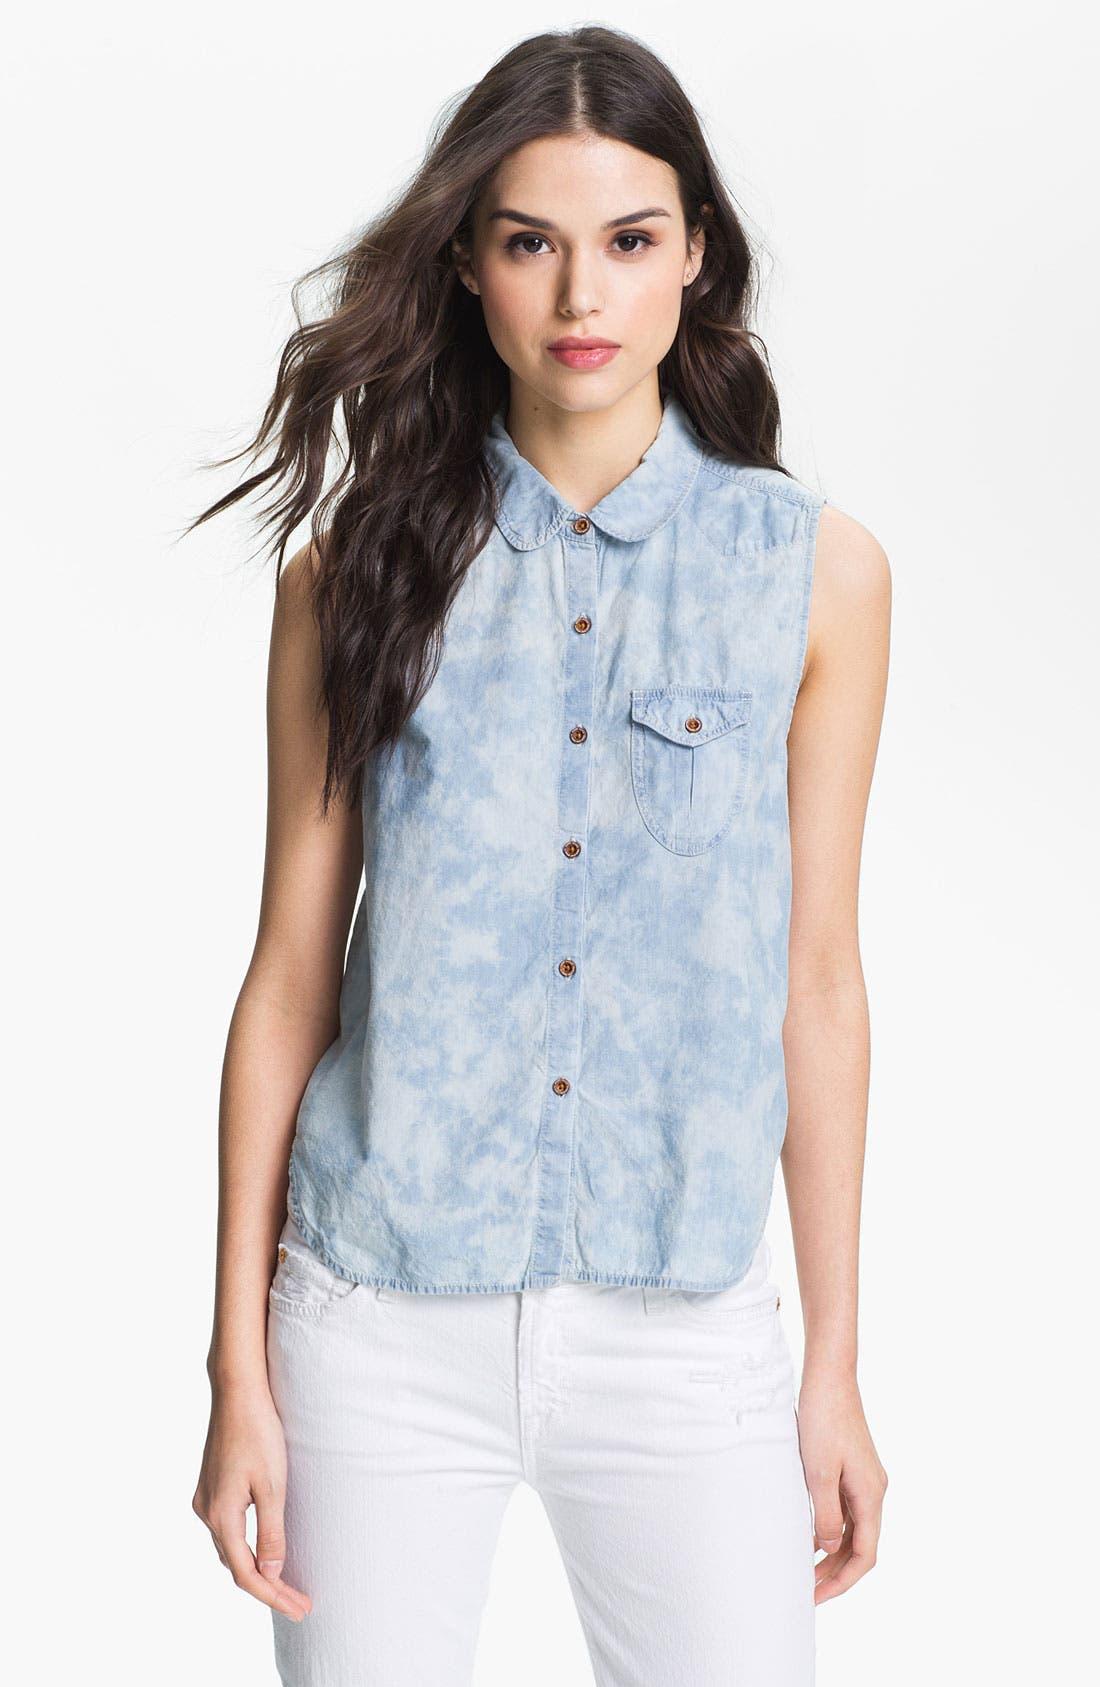 Alternate Image 1 Selected - Maison Scotch 'Arch' Tie Dye Chambray Sleeveless Shirt